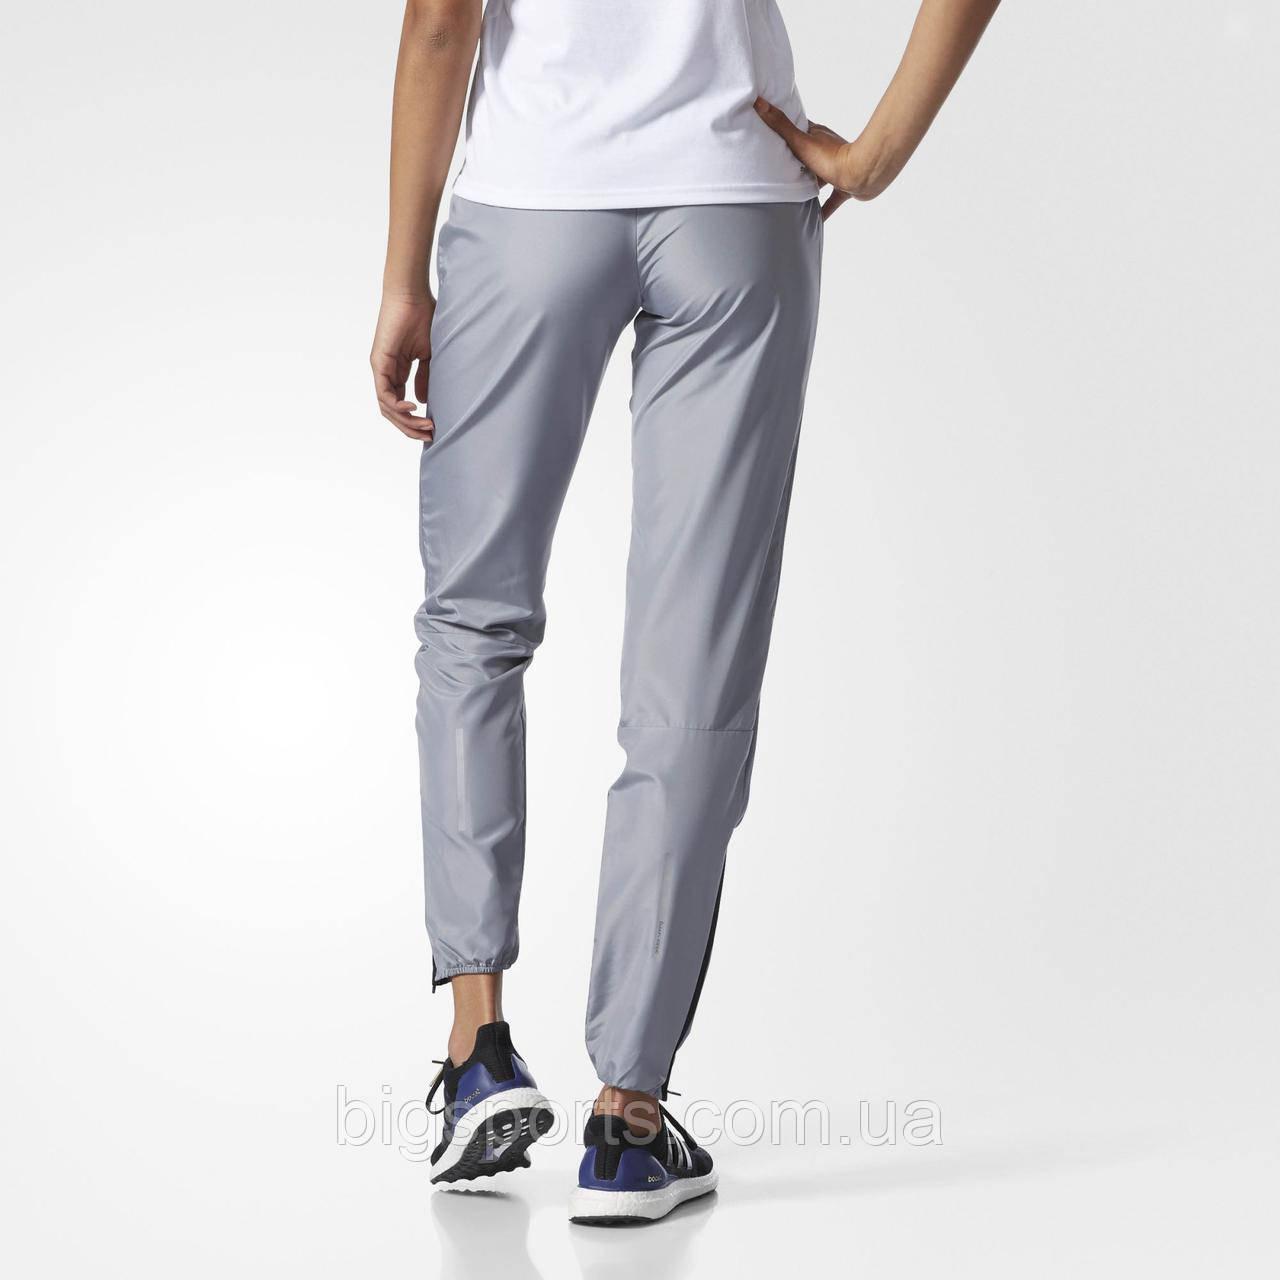 a762fe17 Штаны жен. Adidas RS Wind Pant W (арт. B47757), цена 790 грн., купить в  Днепре — Prom.ua (ID#669182463)